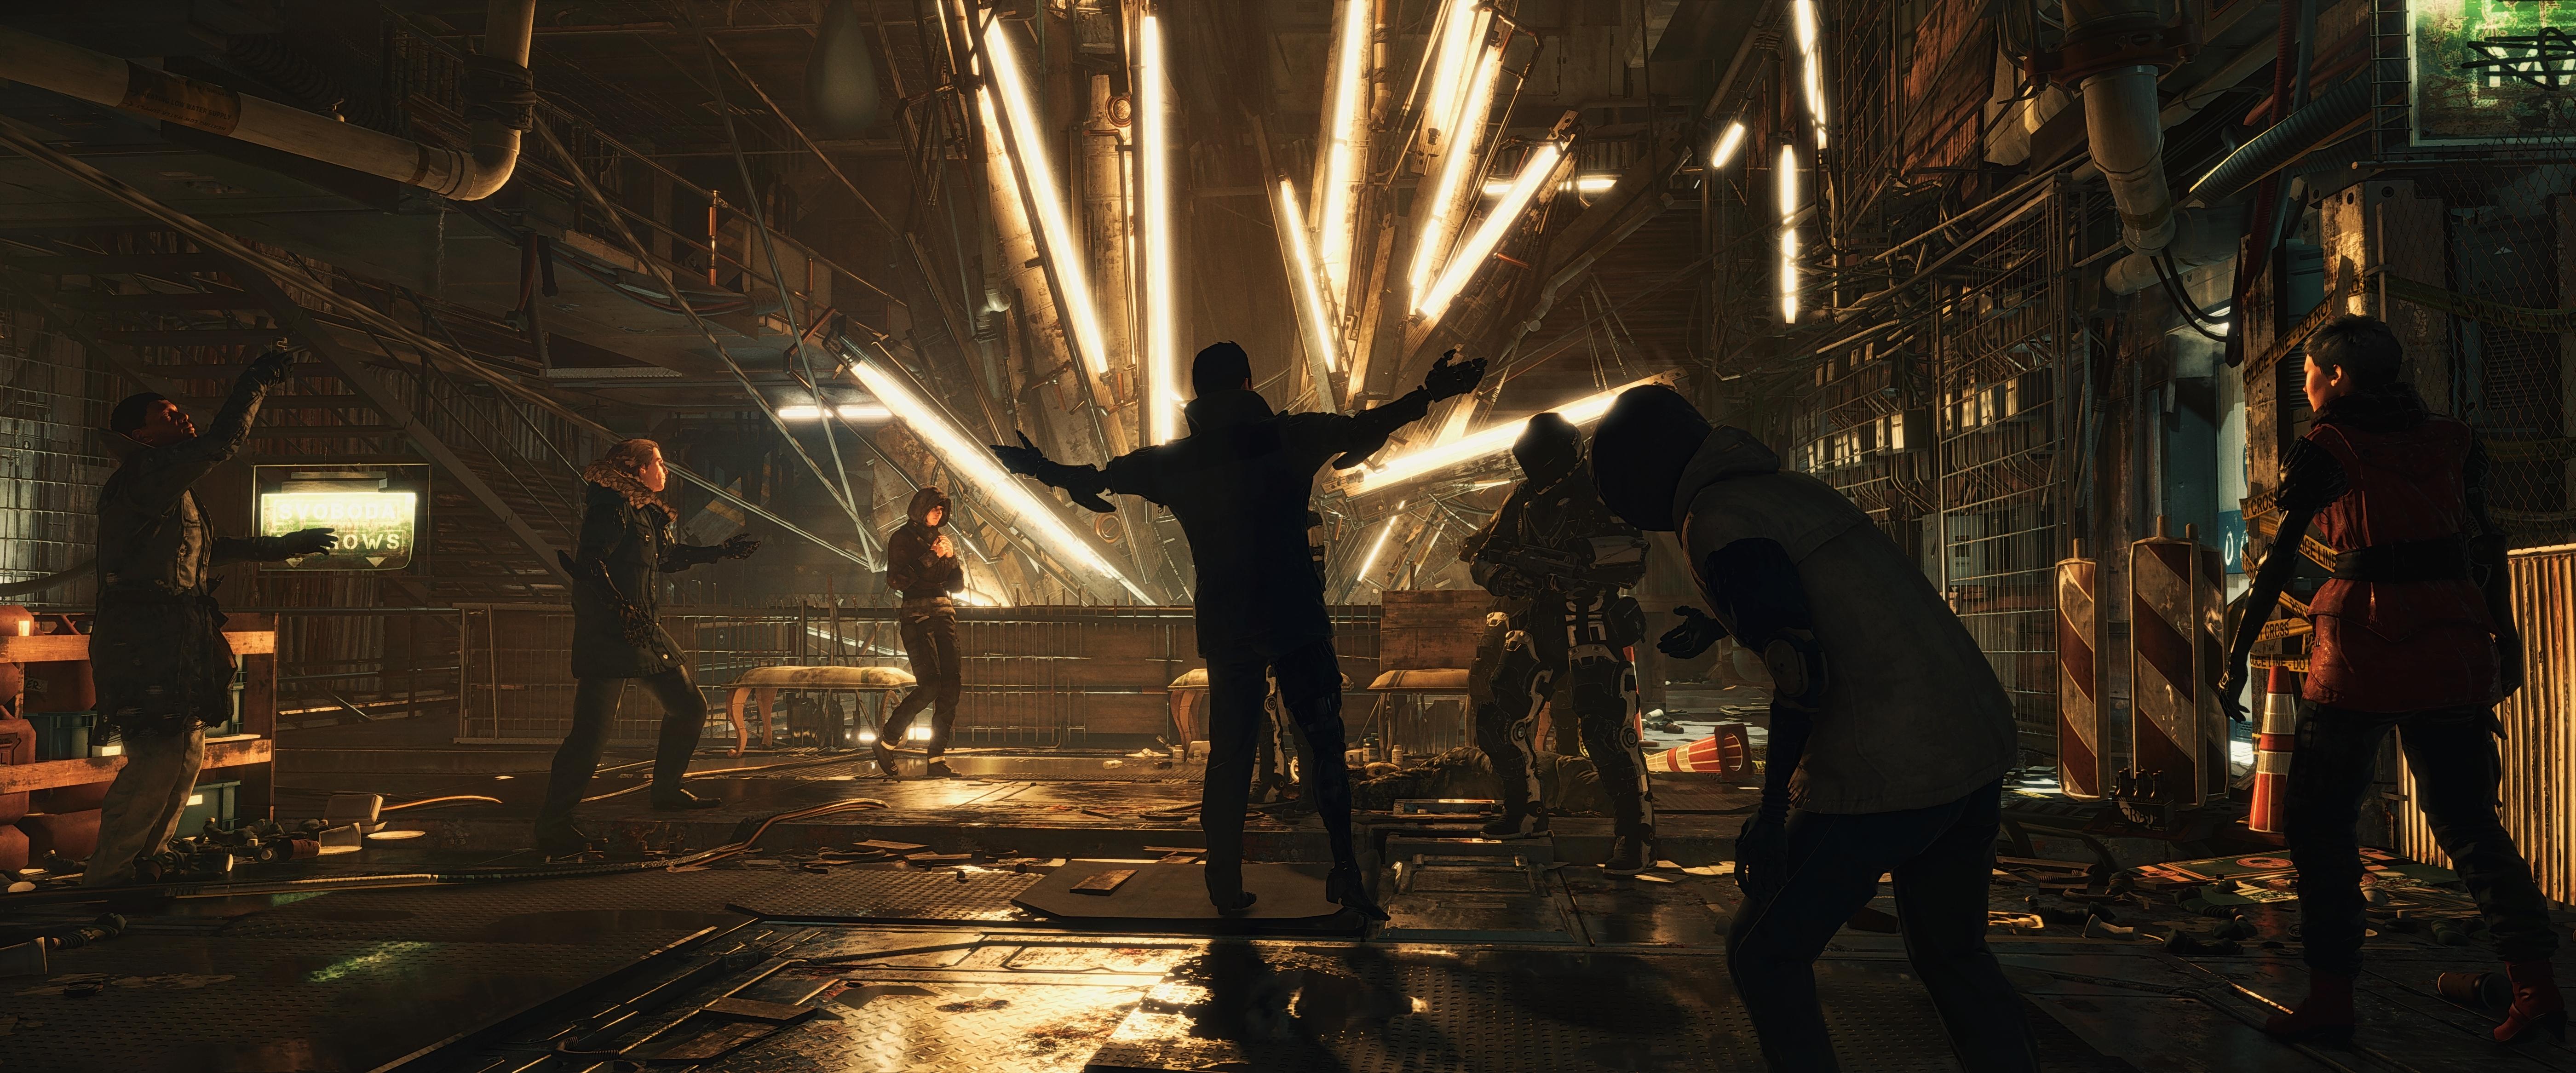 Deus Ex Mankind Divided 4k Ultra Hd Wallpaper Background Image